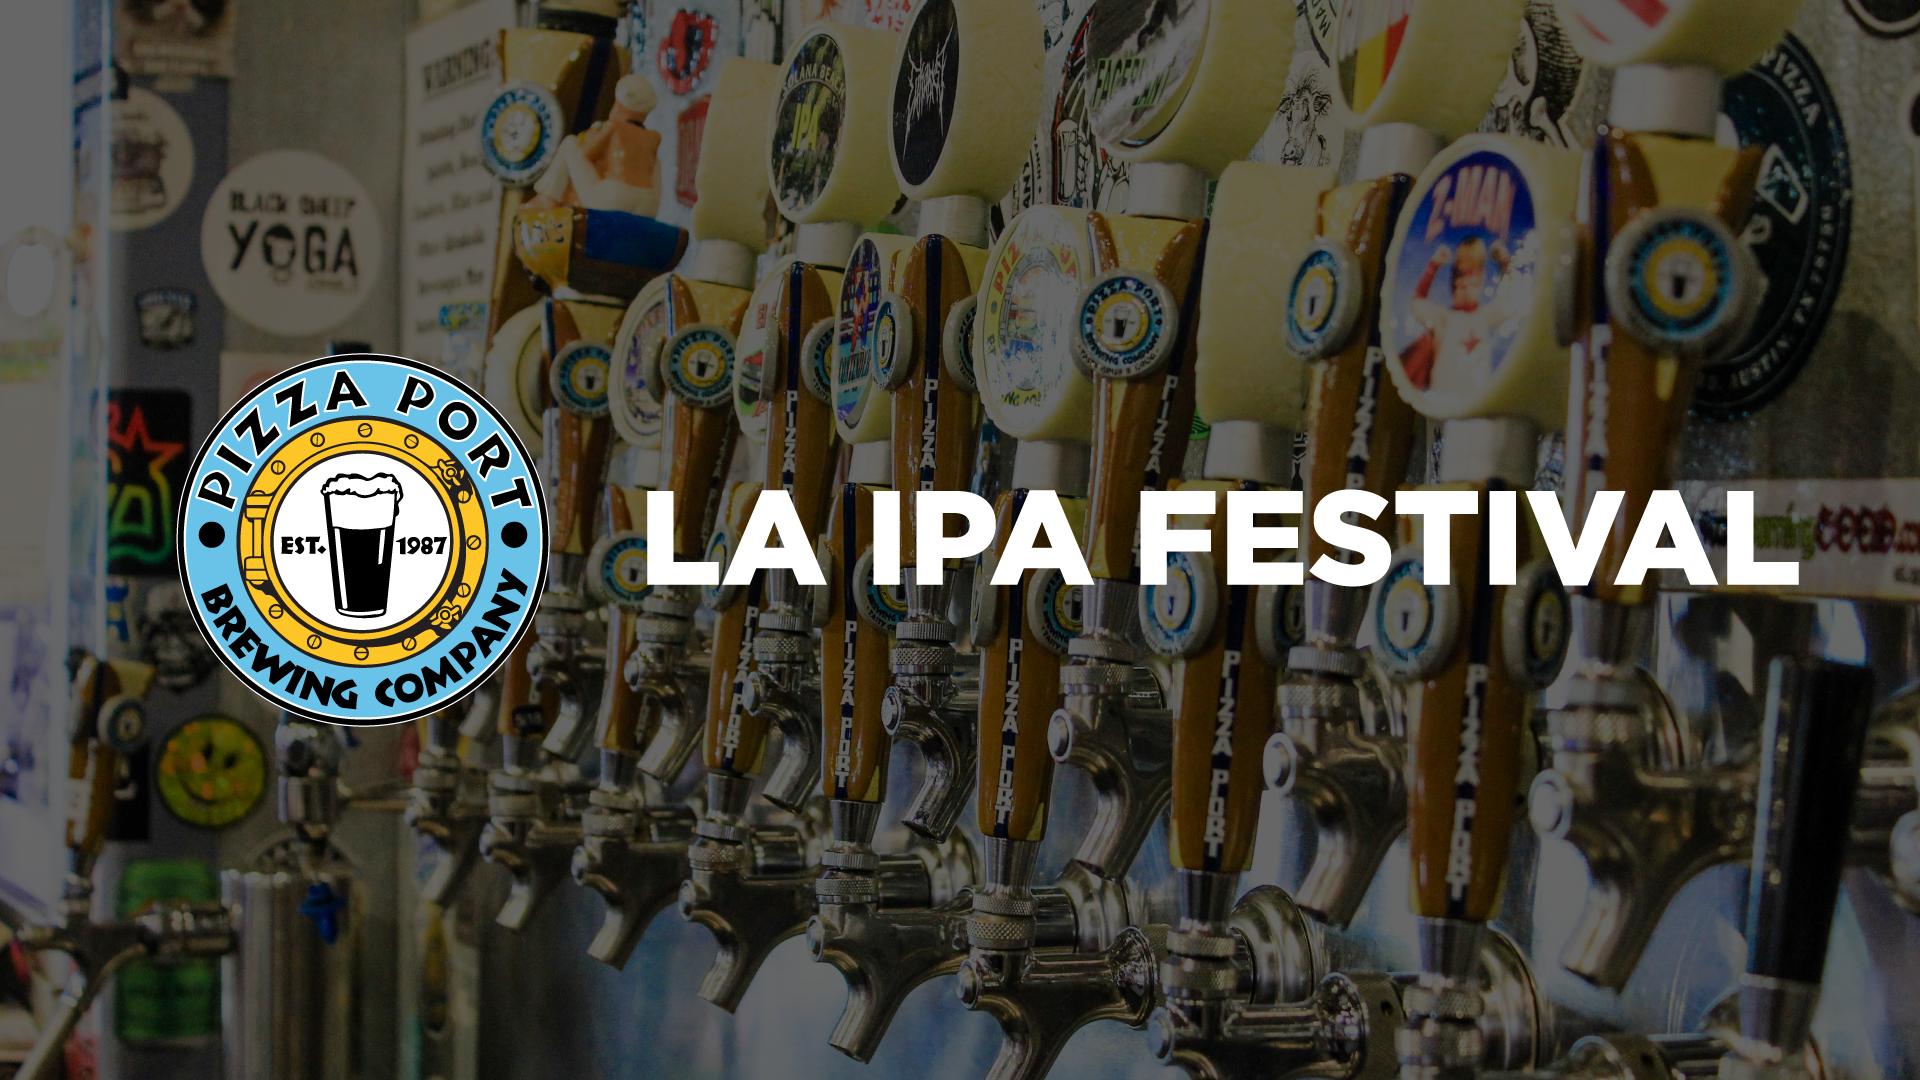 LA IPA Festival